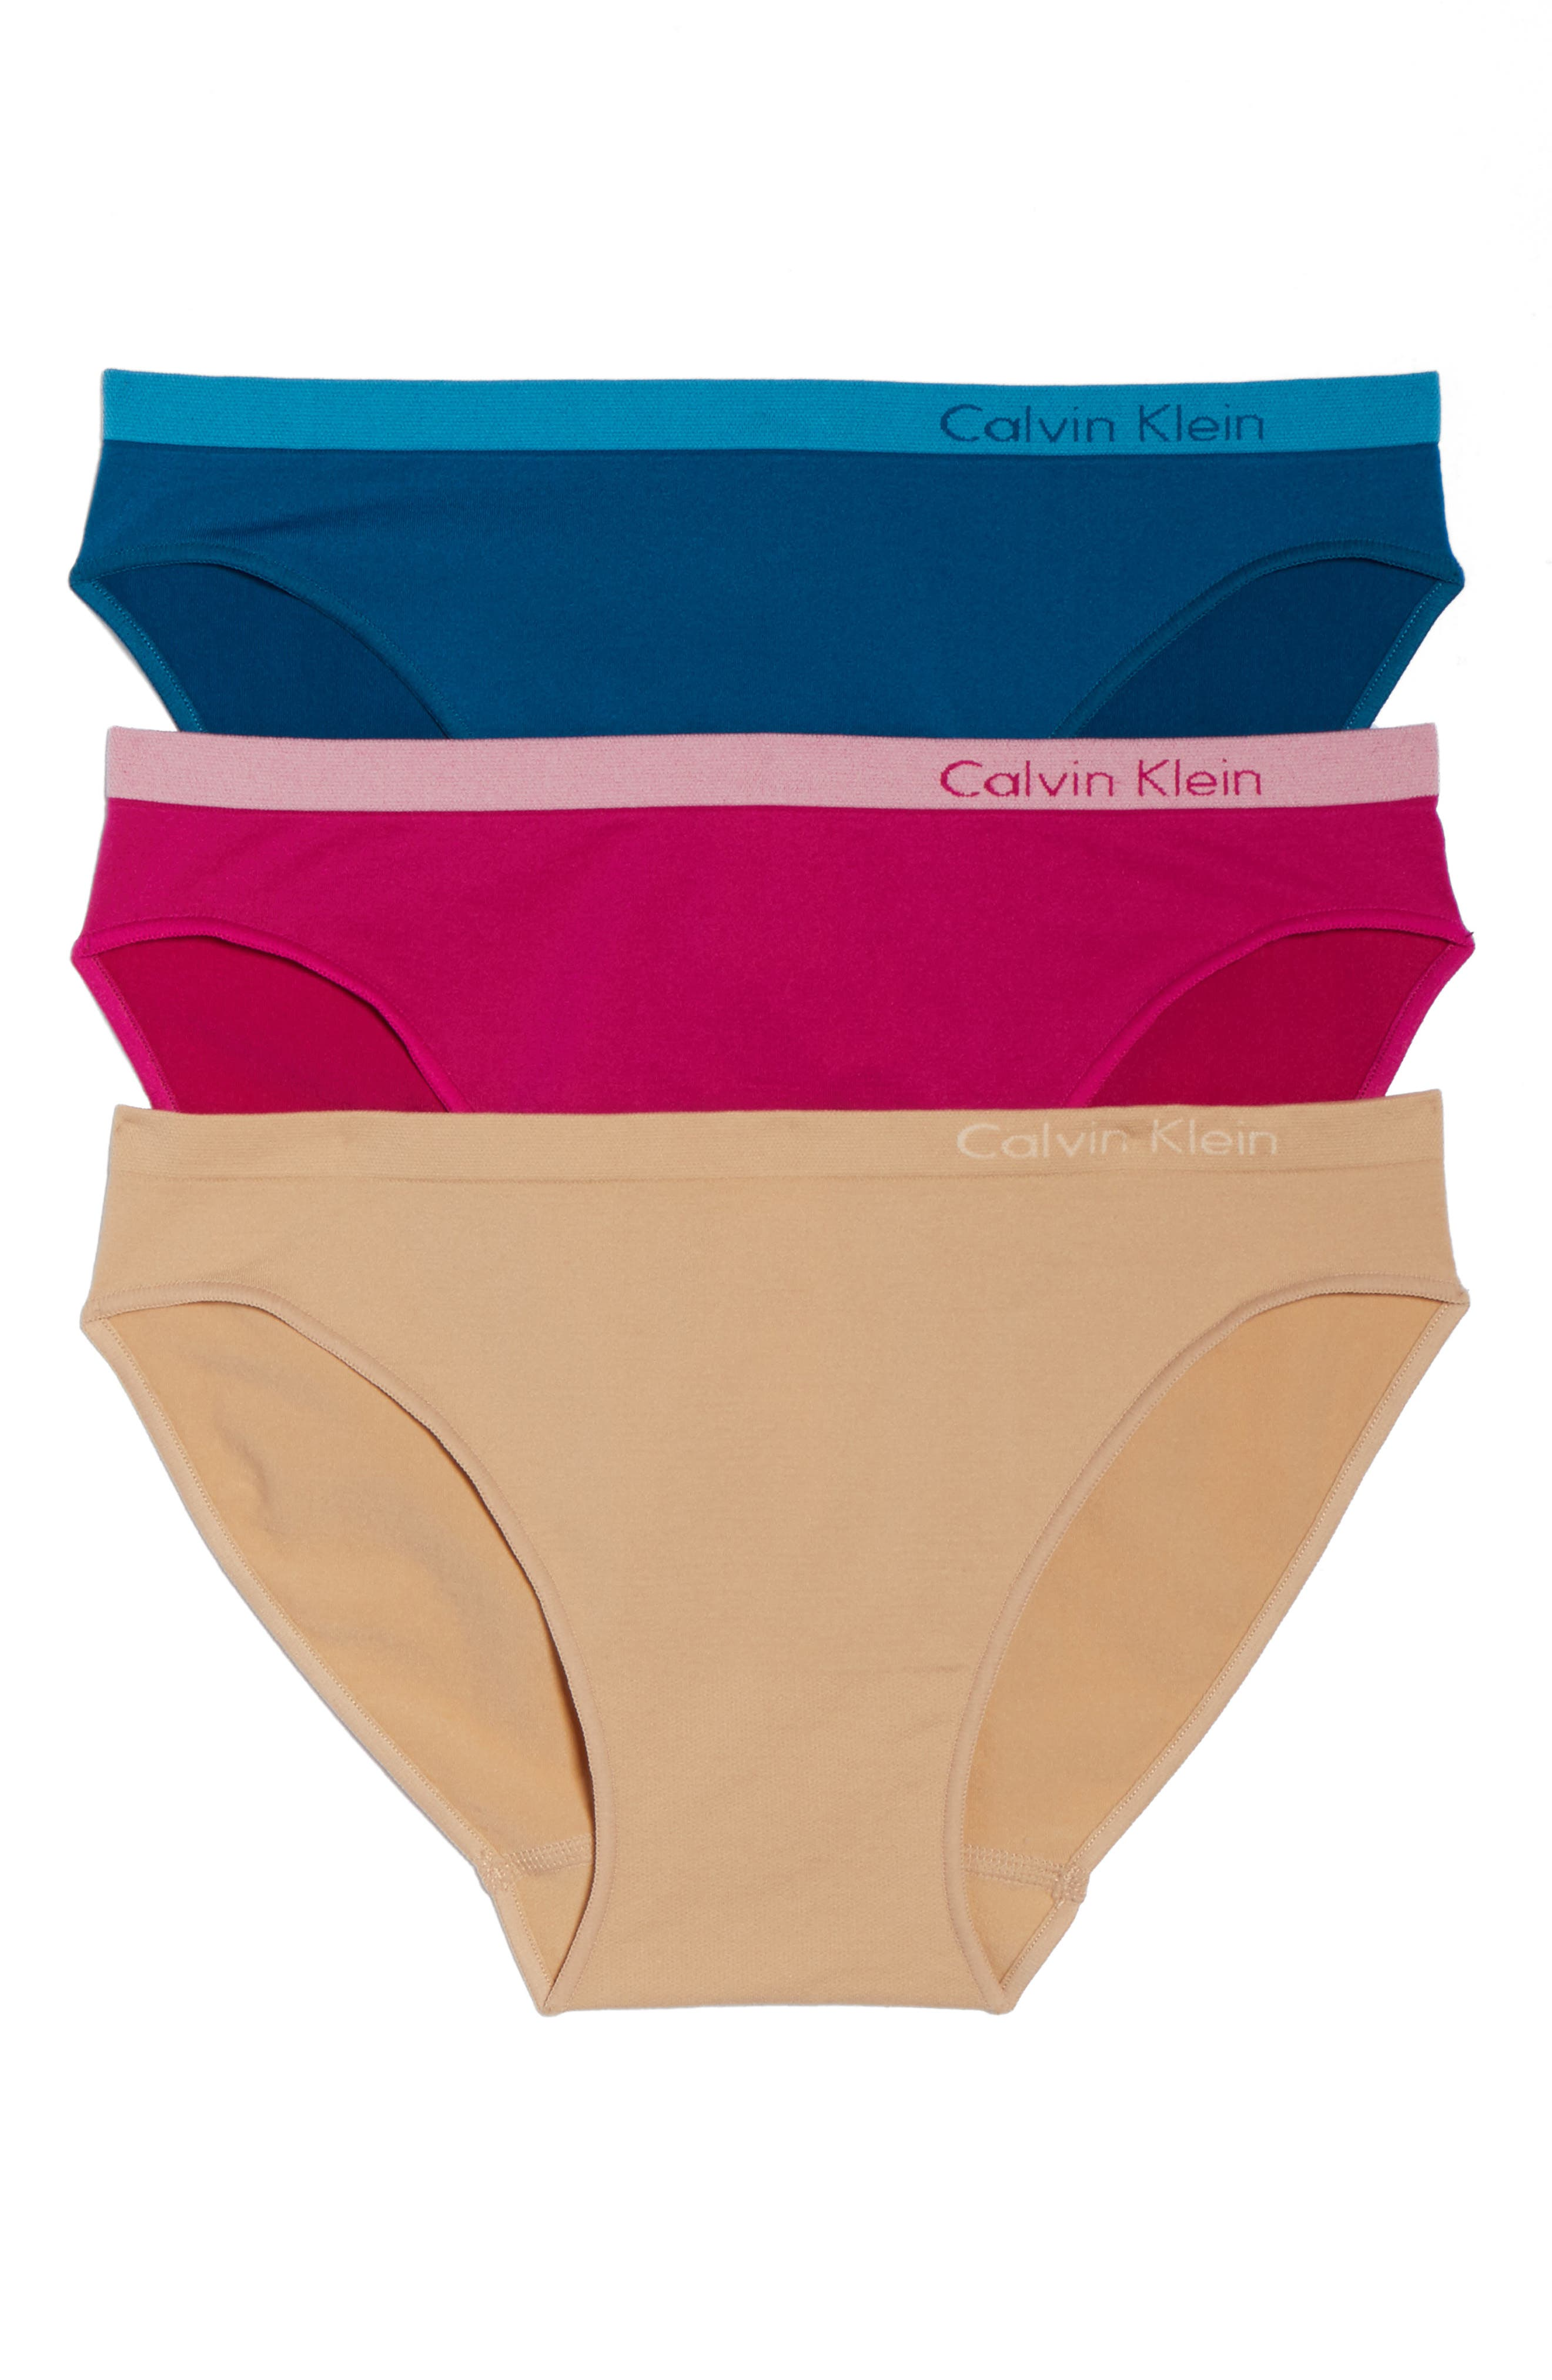 'Pure' Seamless Bikini,                             Main thumbnail 1, color,                             650